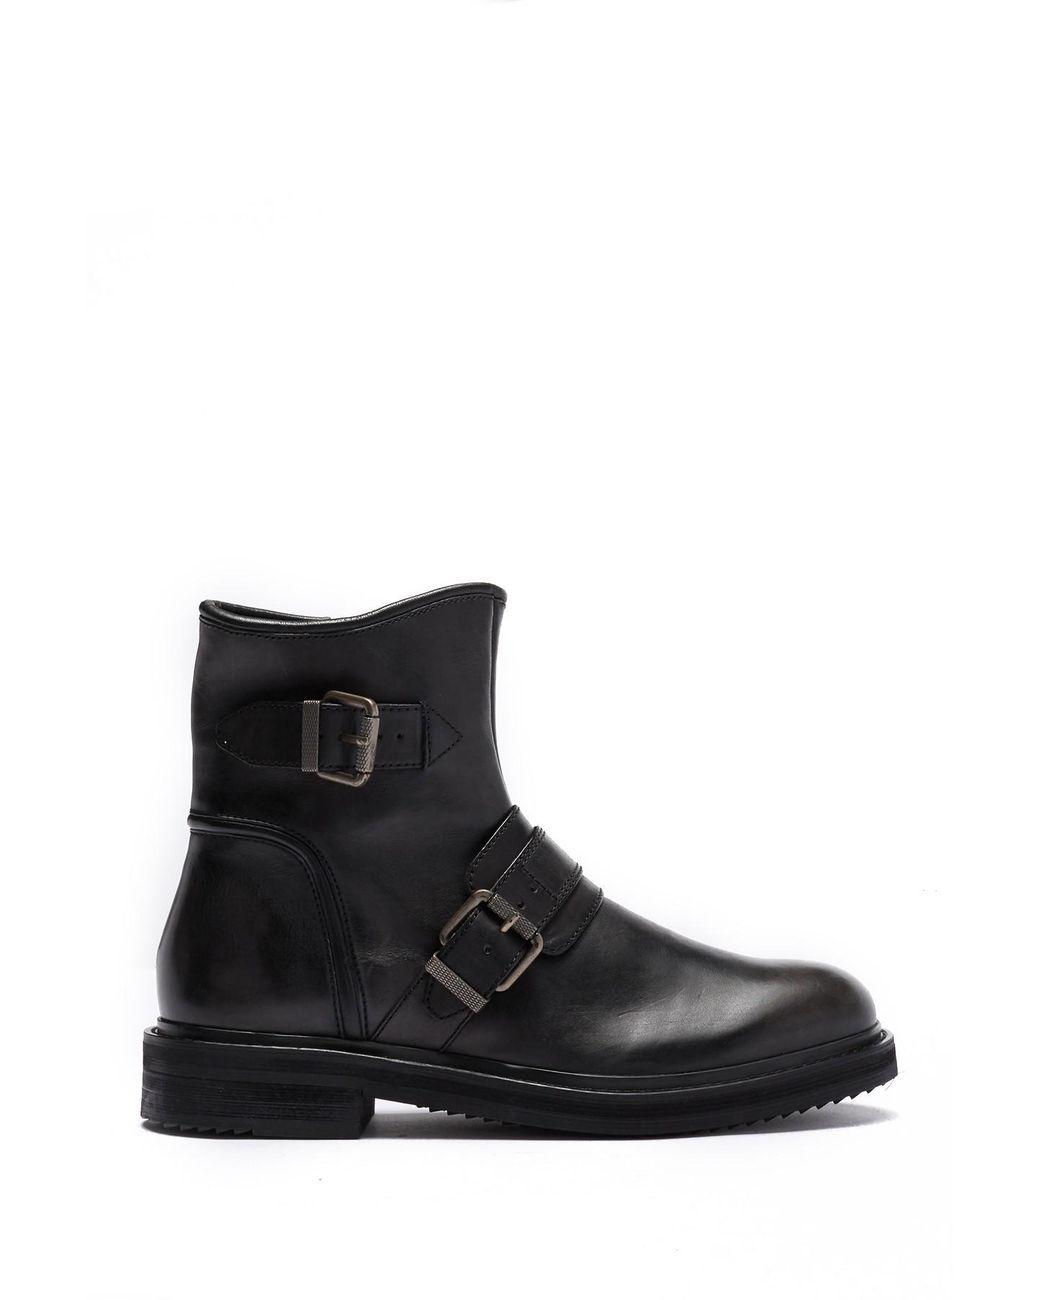 38895a1d0d272 Men's Black Cooper Moto Buckle Boot